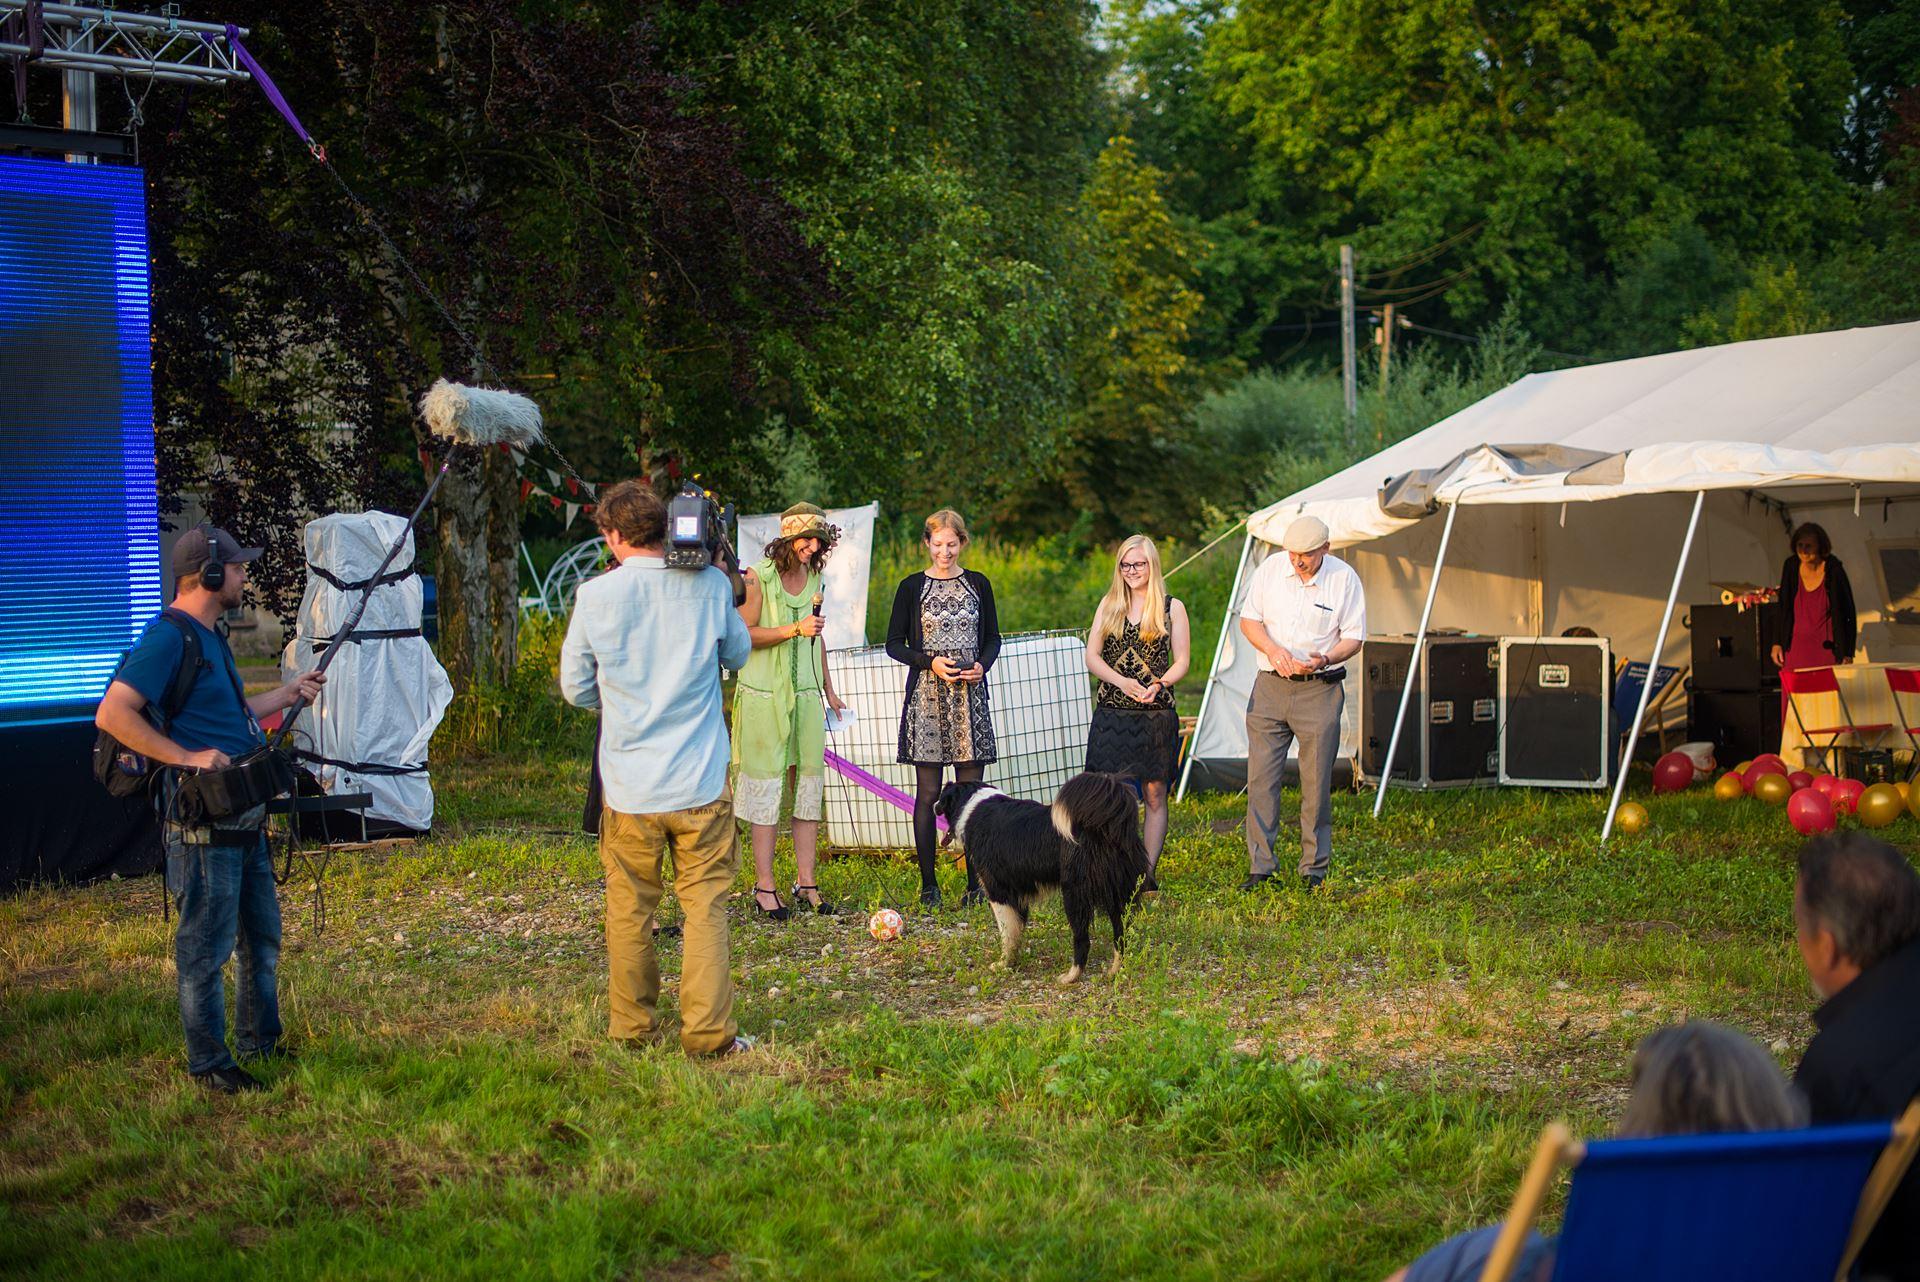 Hobbyfilmcontest Preisträgerinnen Bettina Rittler und Tanja Riedinger